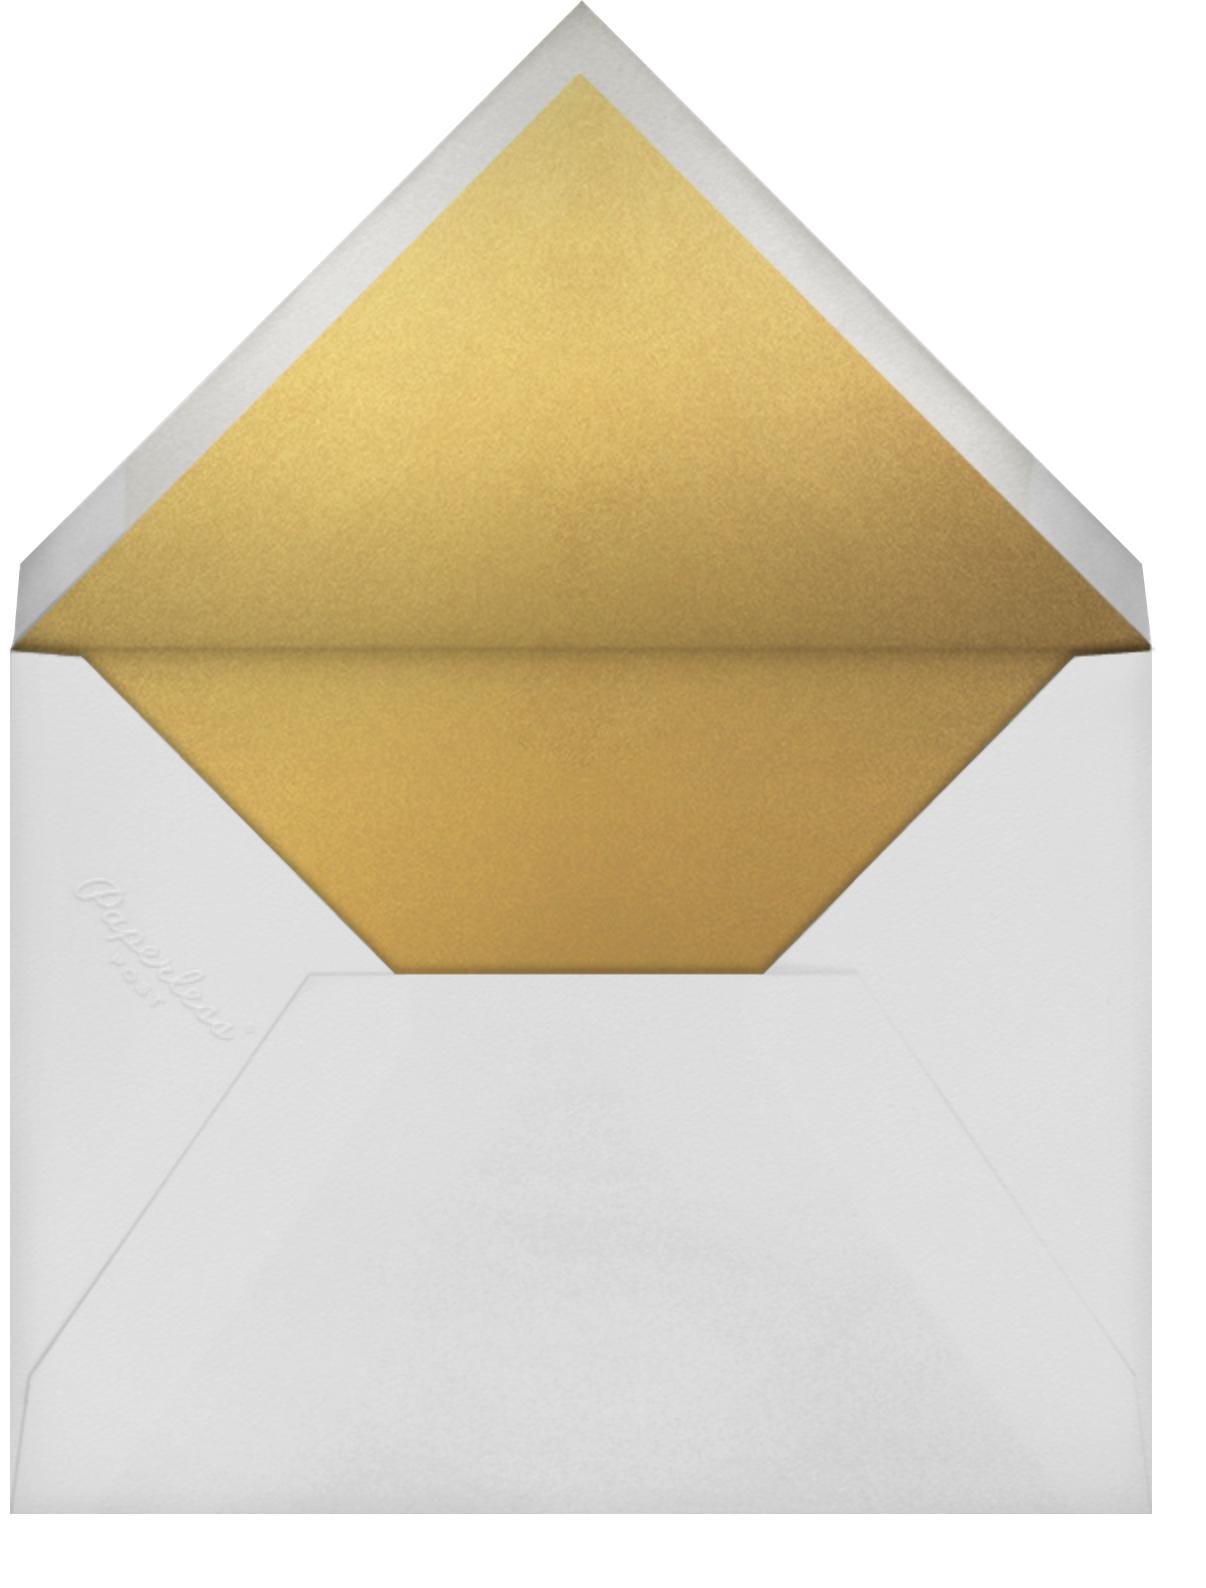 Carrara - Vera Wang - Gold and metallic - envelope back